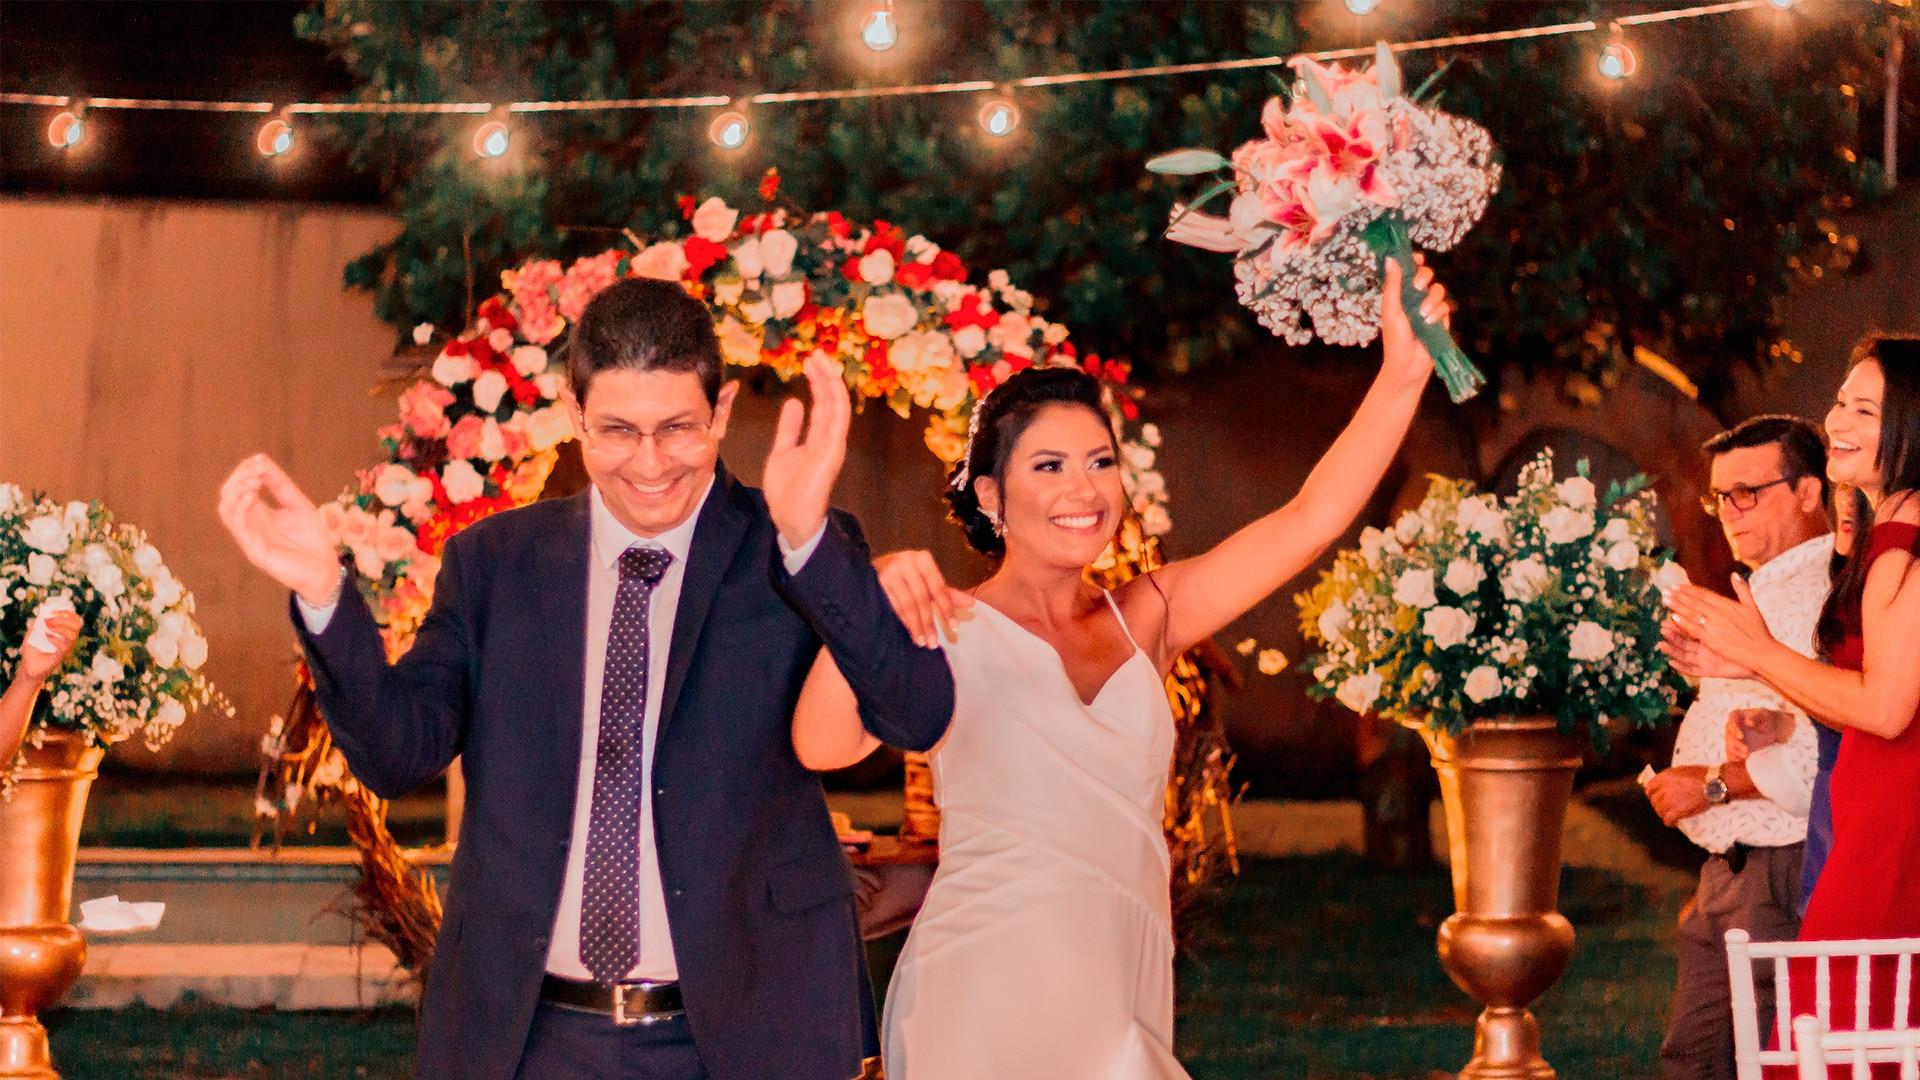 Celebrante de Casamento Ed Rodrigues com casal de noivos festejando casamento